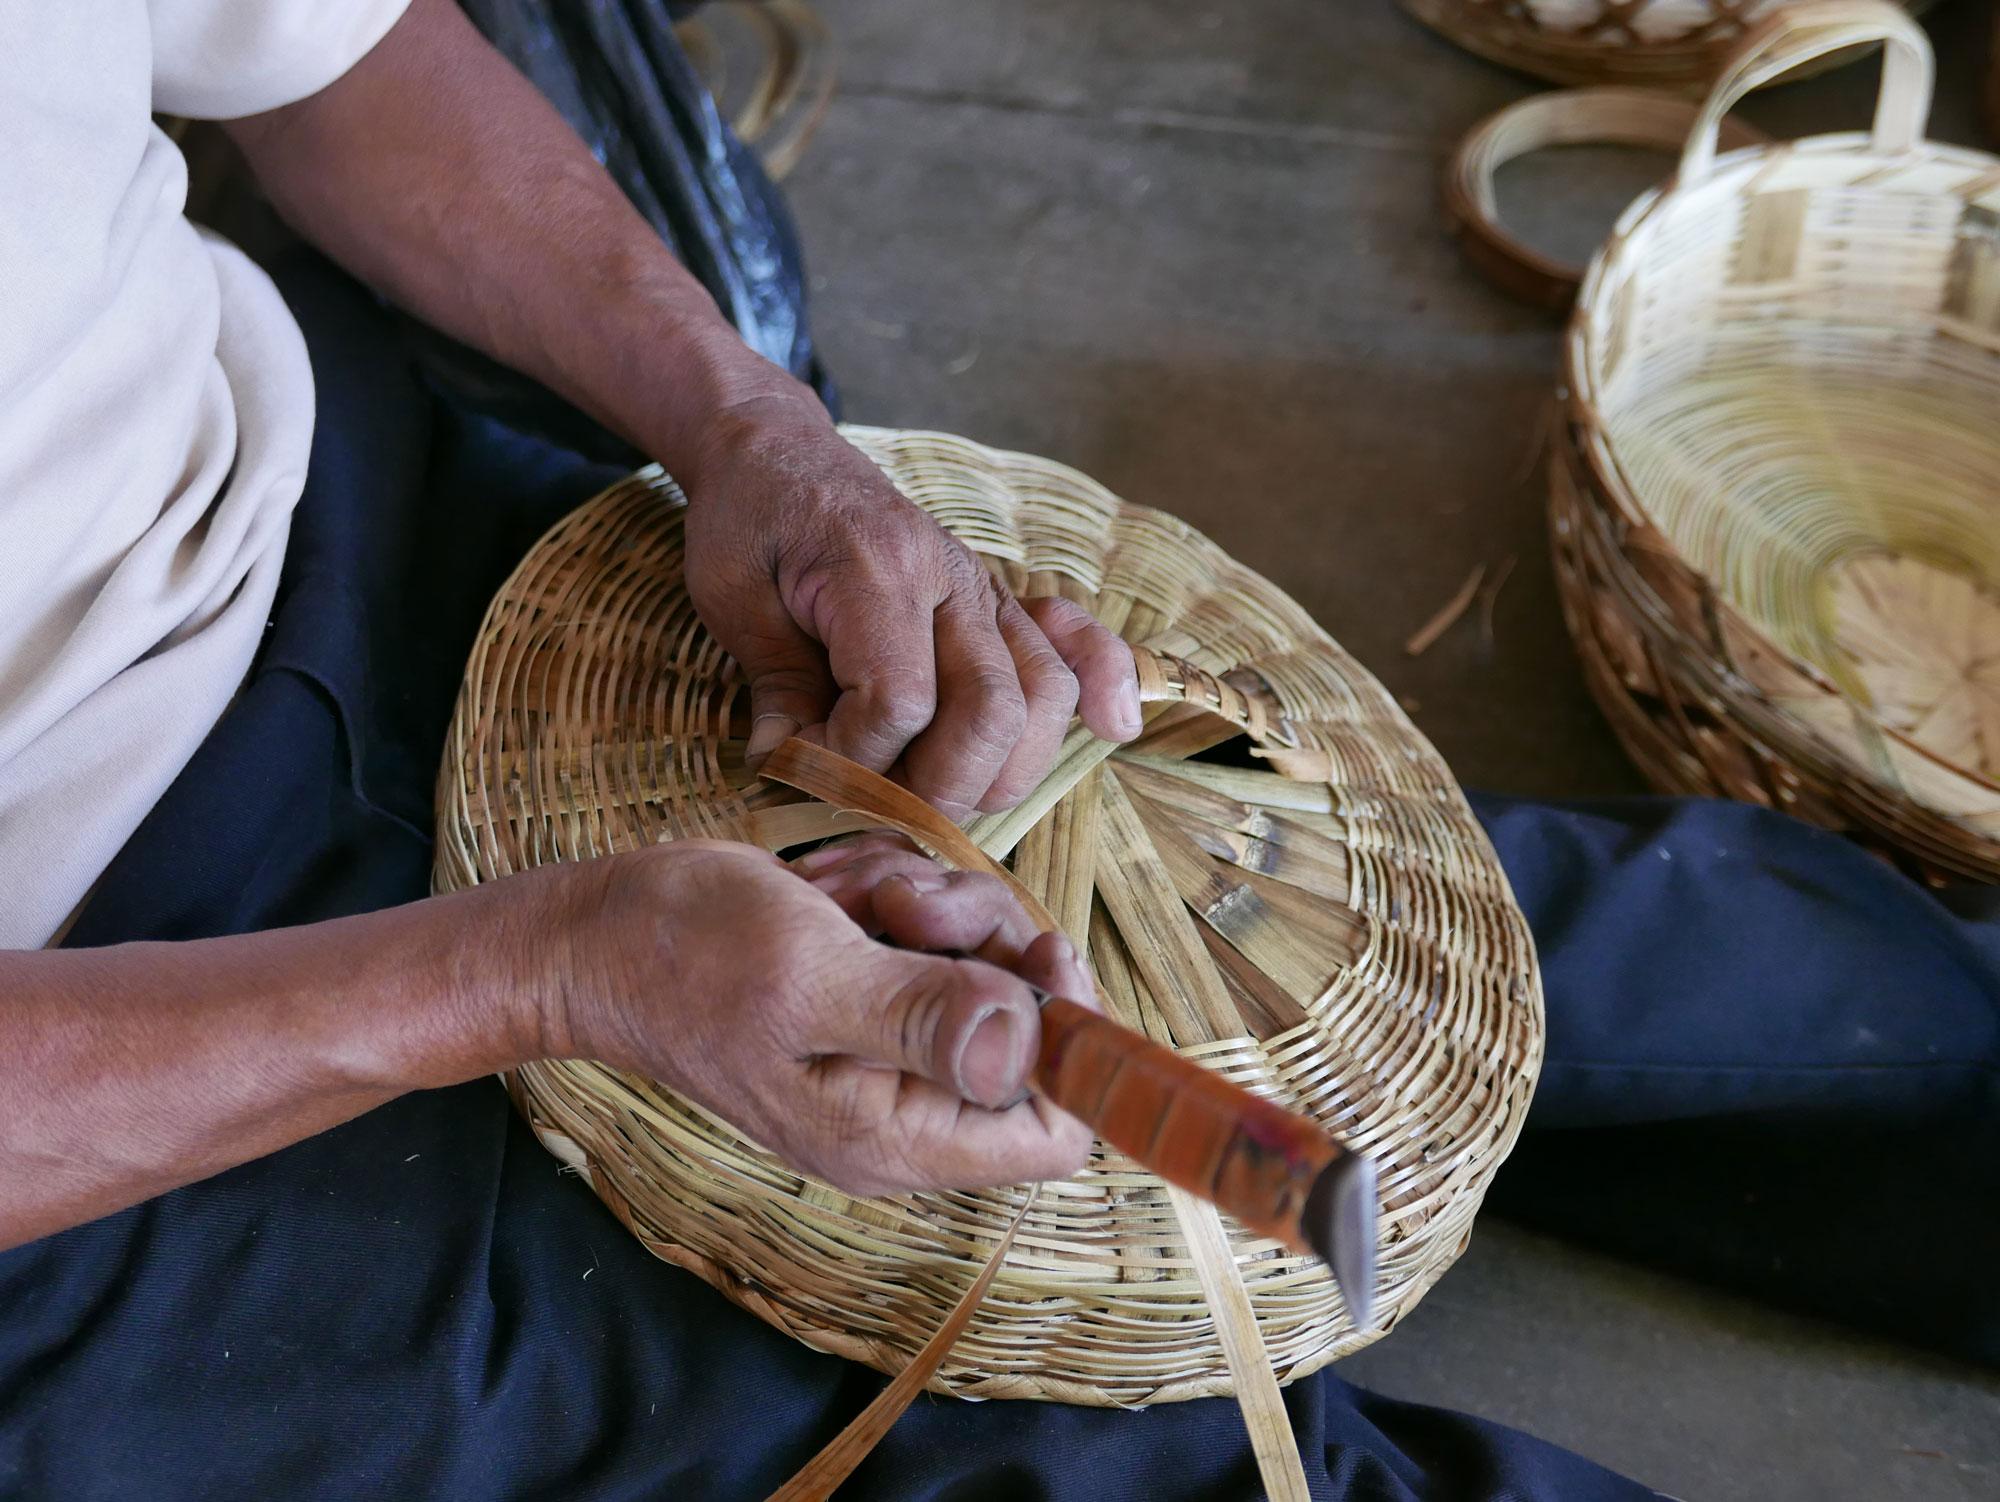 How to Weave a Basket in Oaxaca Mexico - www.nidocollective.com/carrizoweaving #carrizo #canastascarrizo #basketweaving